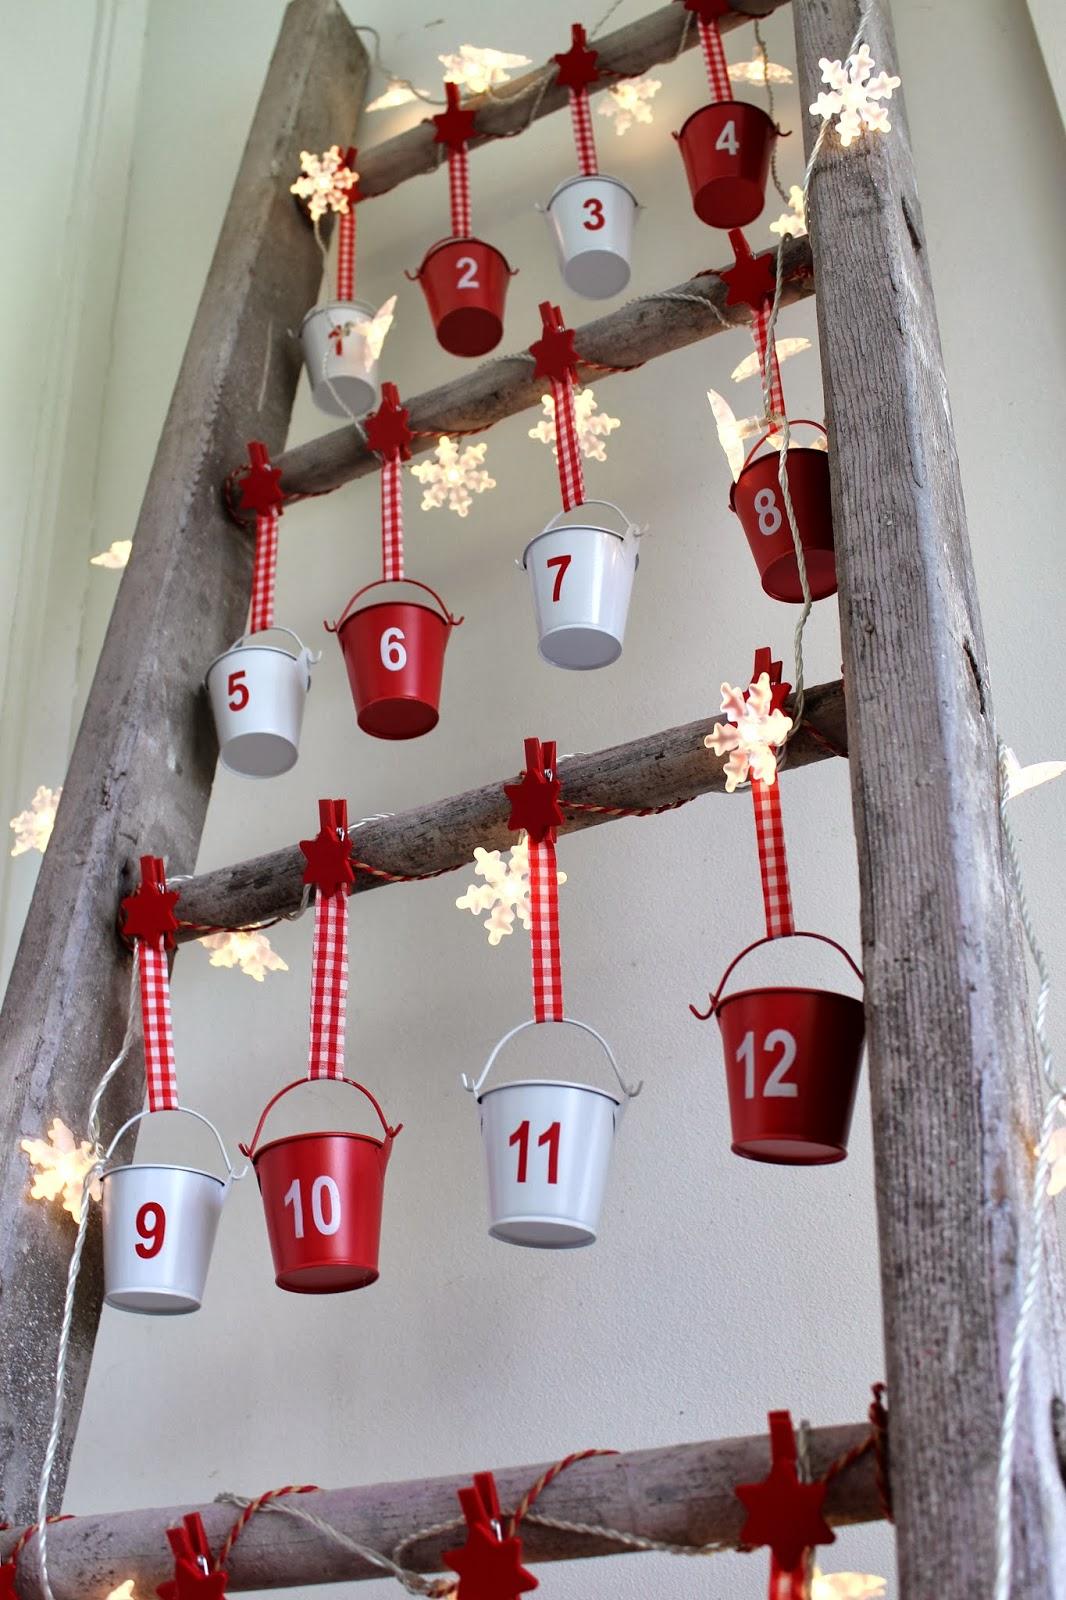 kalendarze-adwentowe-green-canoe-advent-calendar-diy-drabina